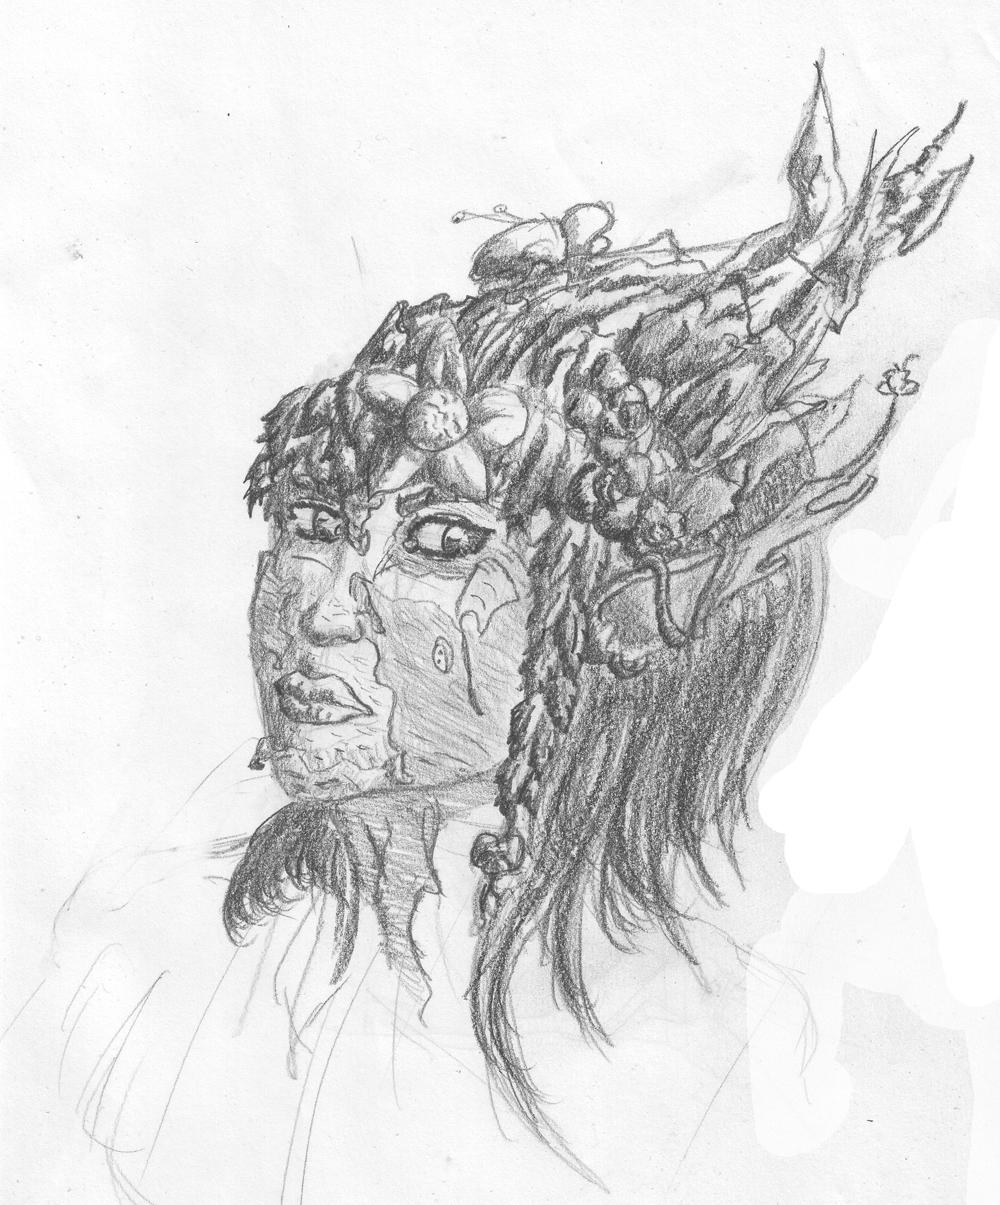 Spriggan Head by Loup-sauvage